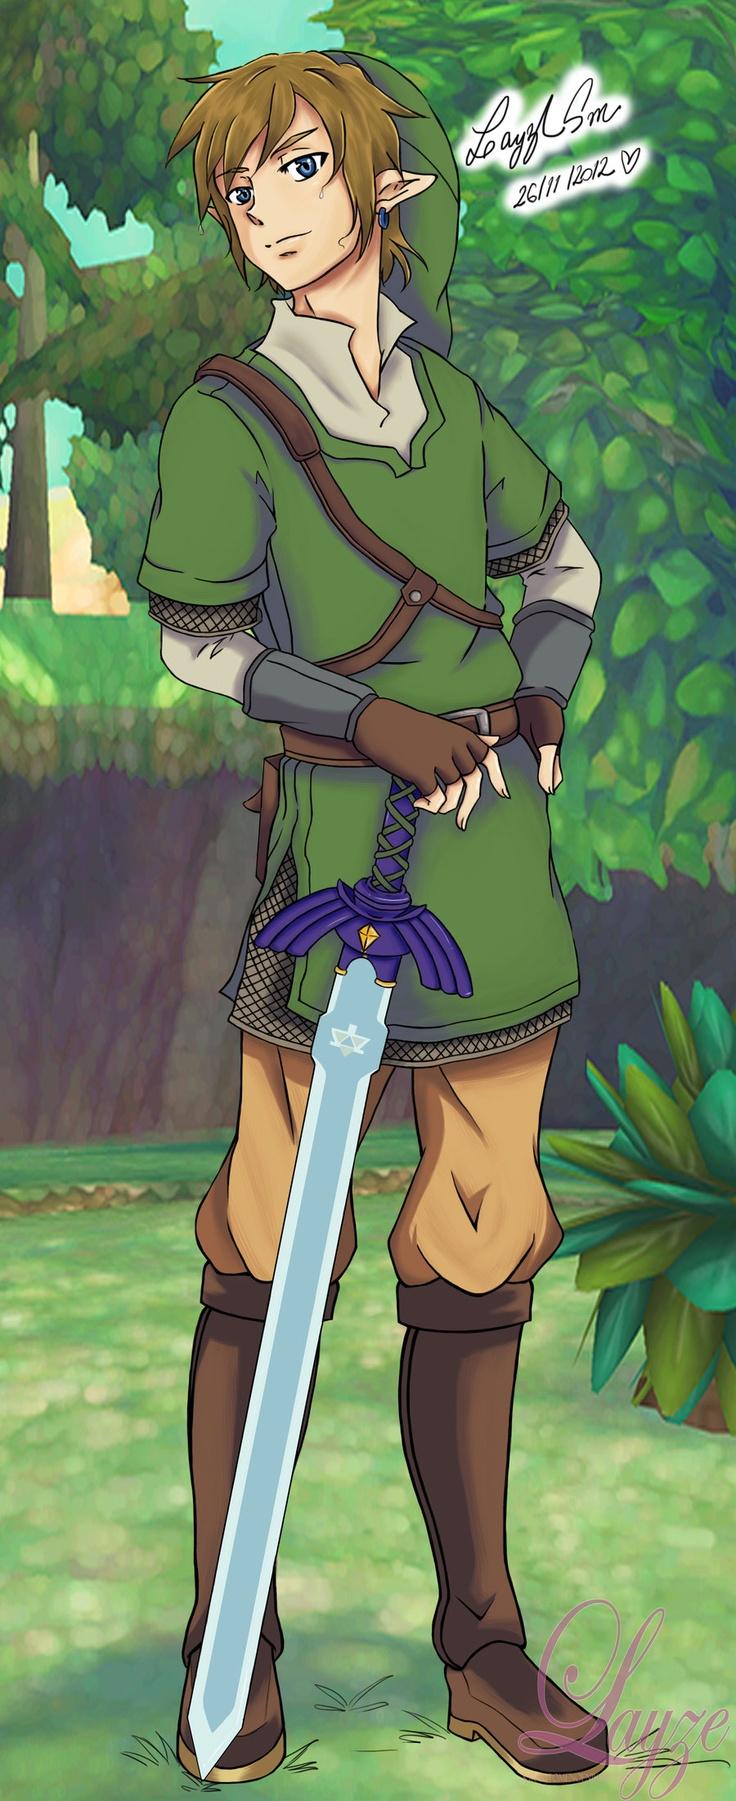 zelda and link relationship skyward sword